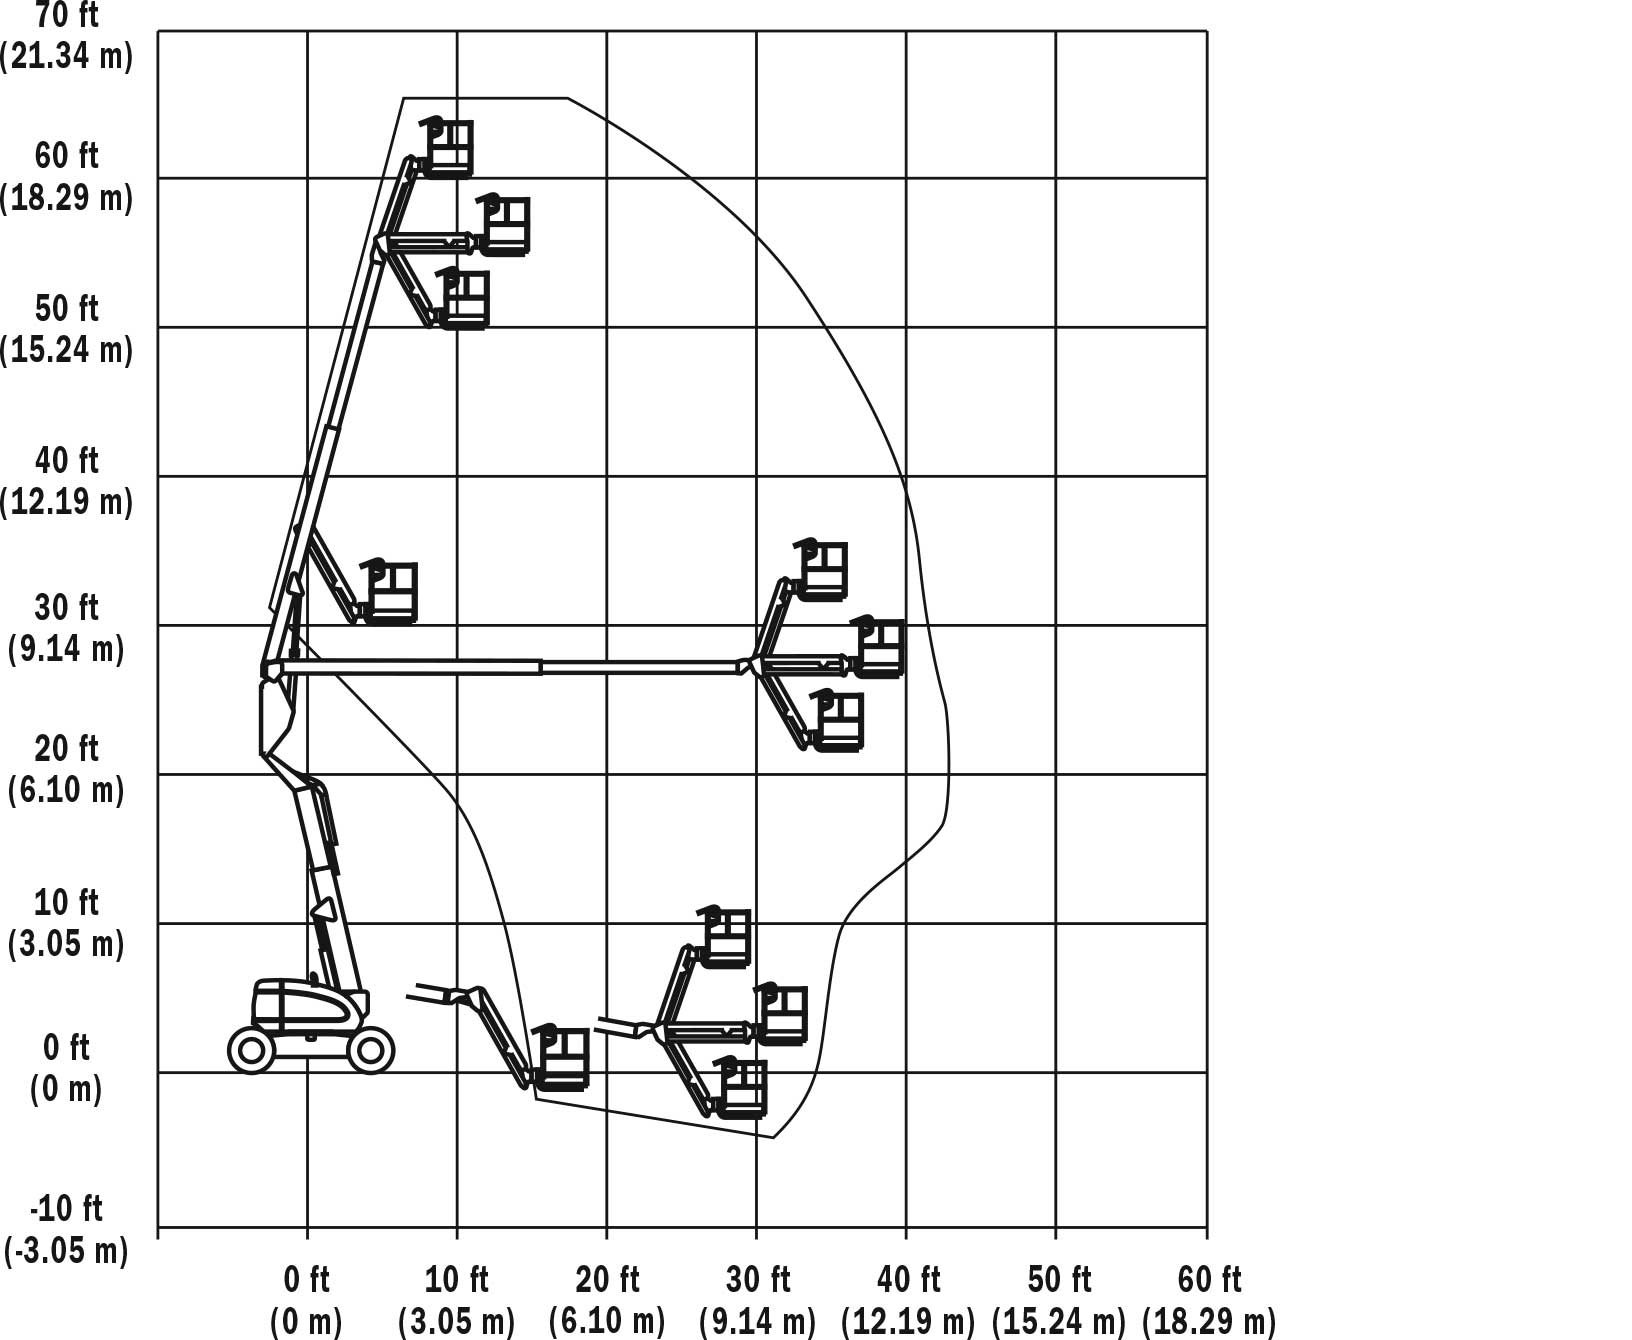 JLG 600AJ Articulating Boom Lift Reach Diagram